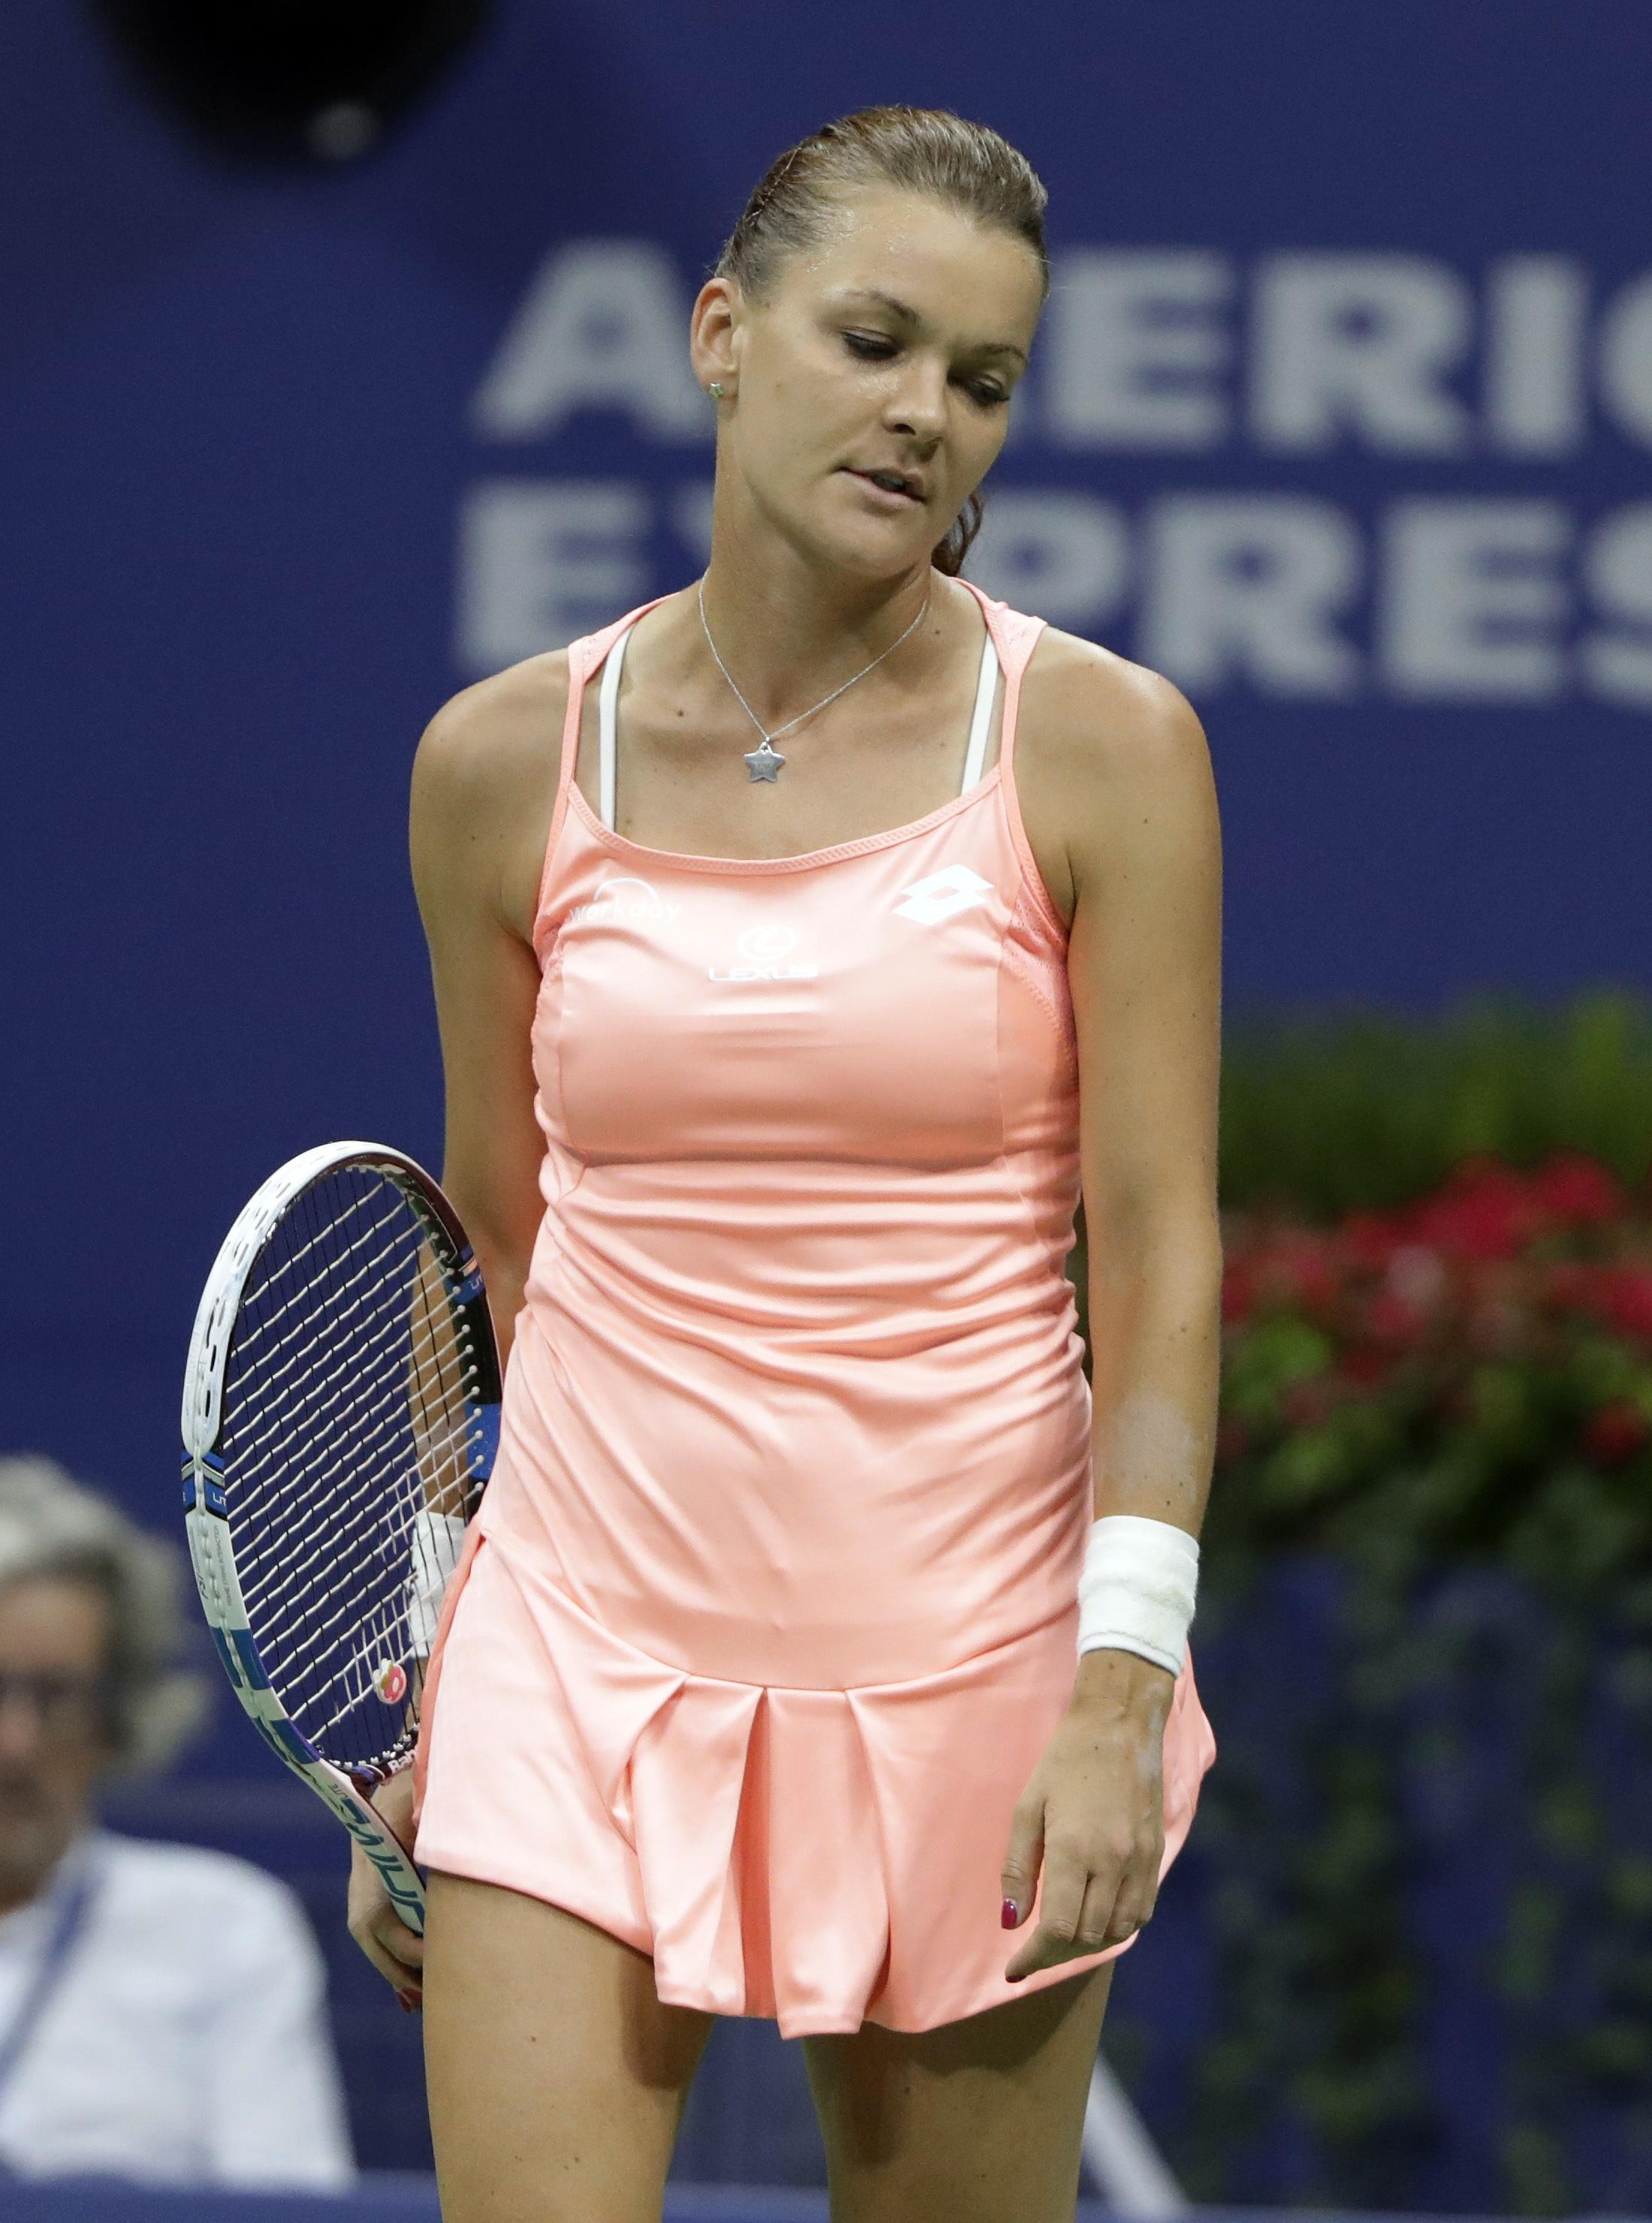 Agnieszka Radwanska, of Poland, reacts after missing a shot against Ana Konjuh, of Croatia, during the U.S. Open tennis tournament, Monday, Sept. 5, 2016, in New York. (AP Photo/Darron Cummings)